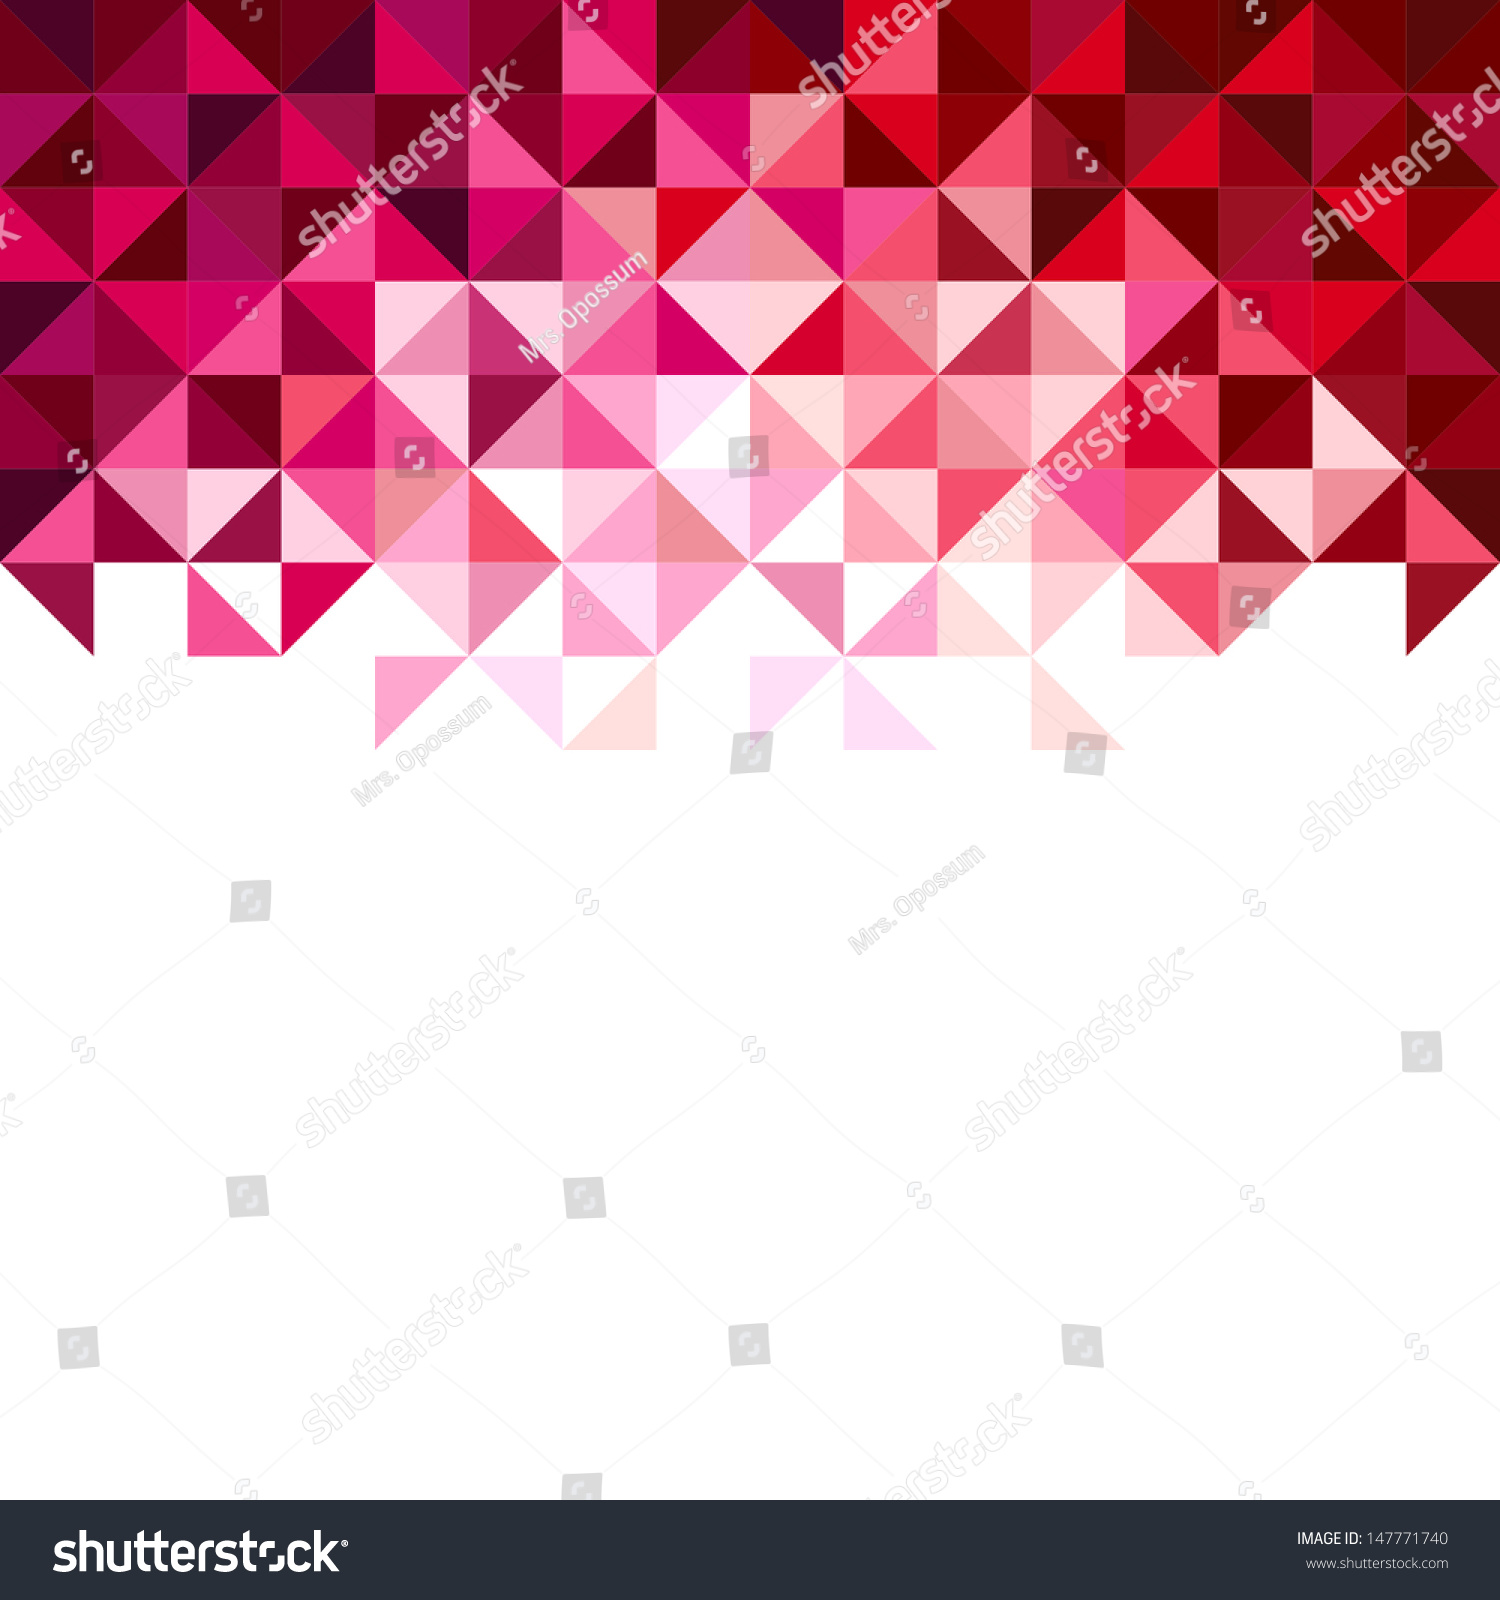 stock vector geometric background - photo #45